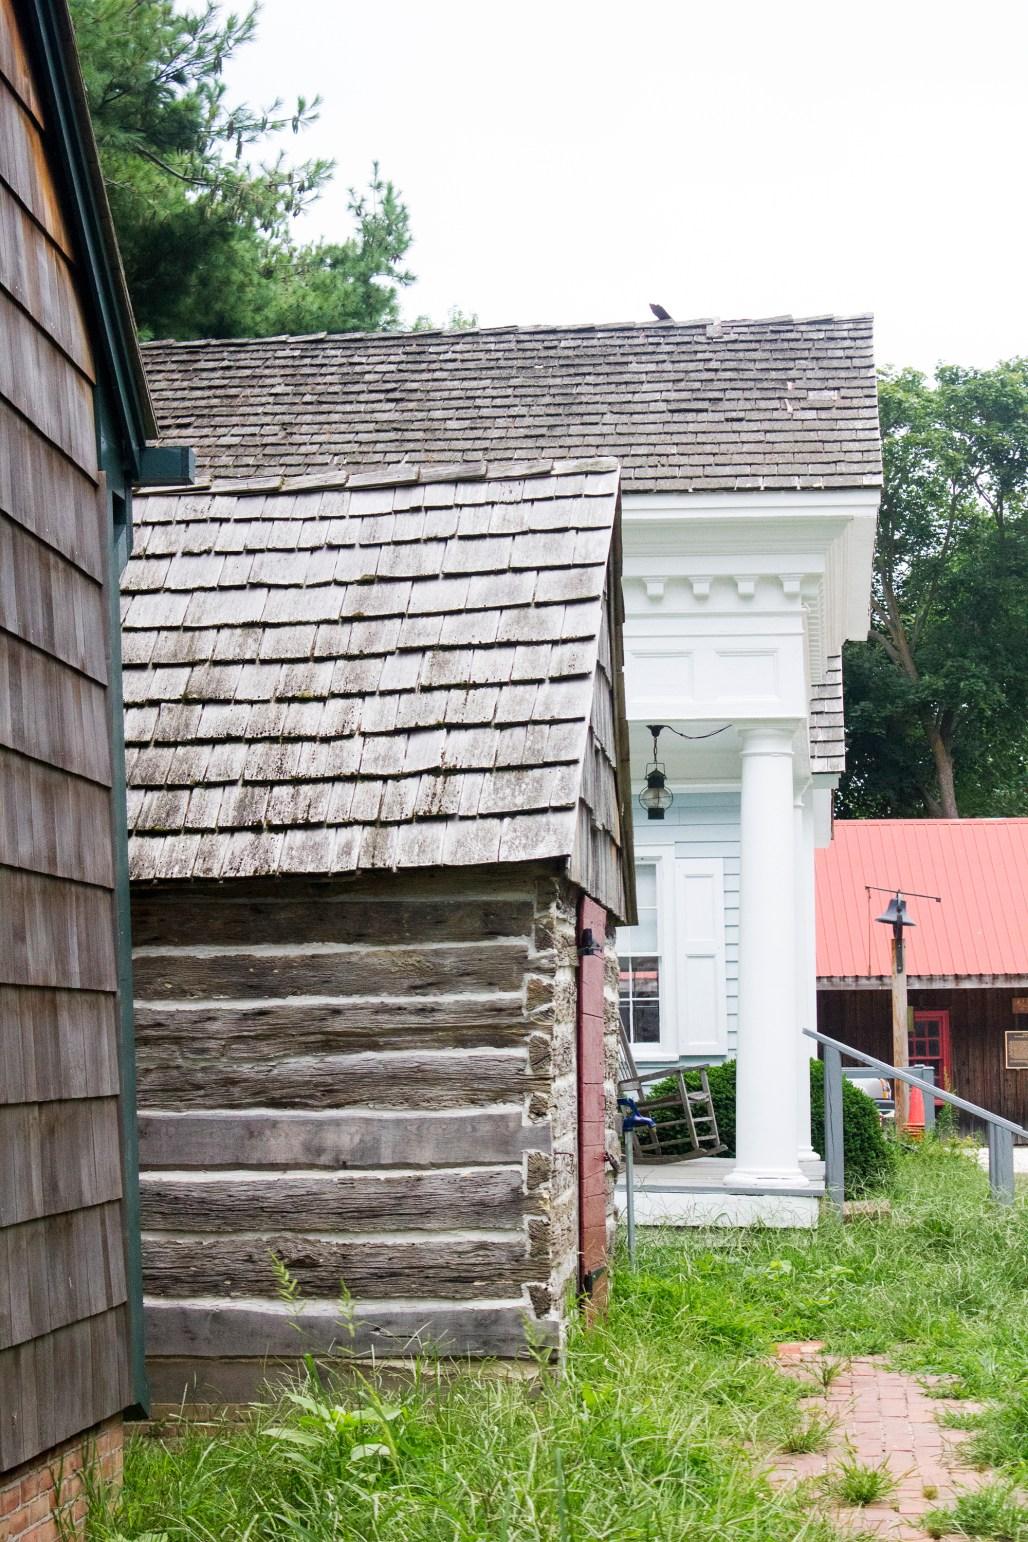 slave-hut-lewes-historical-5